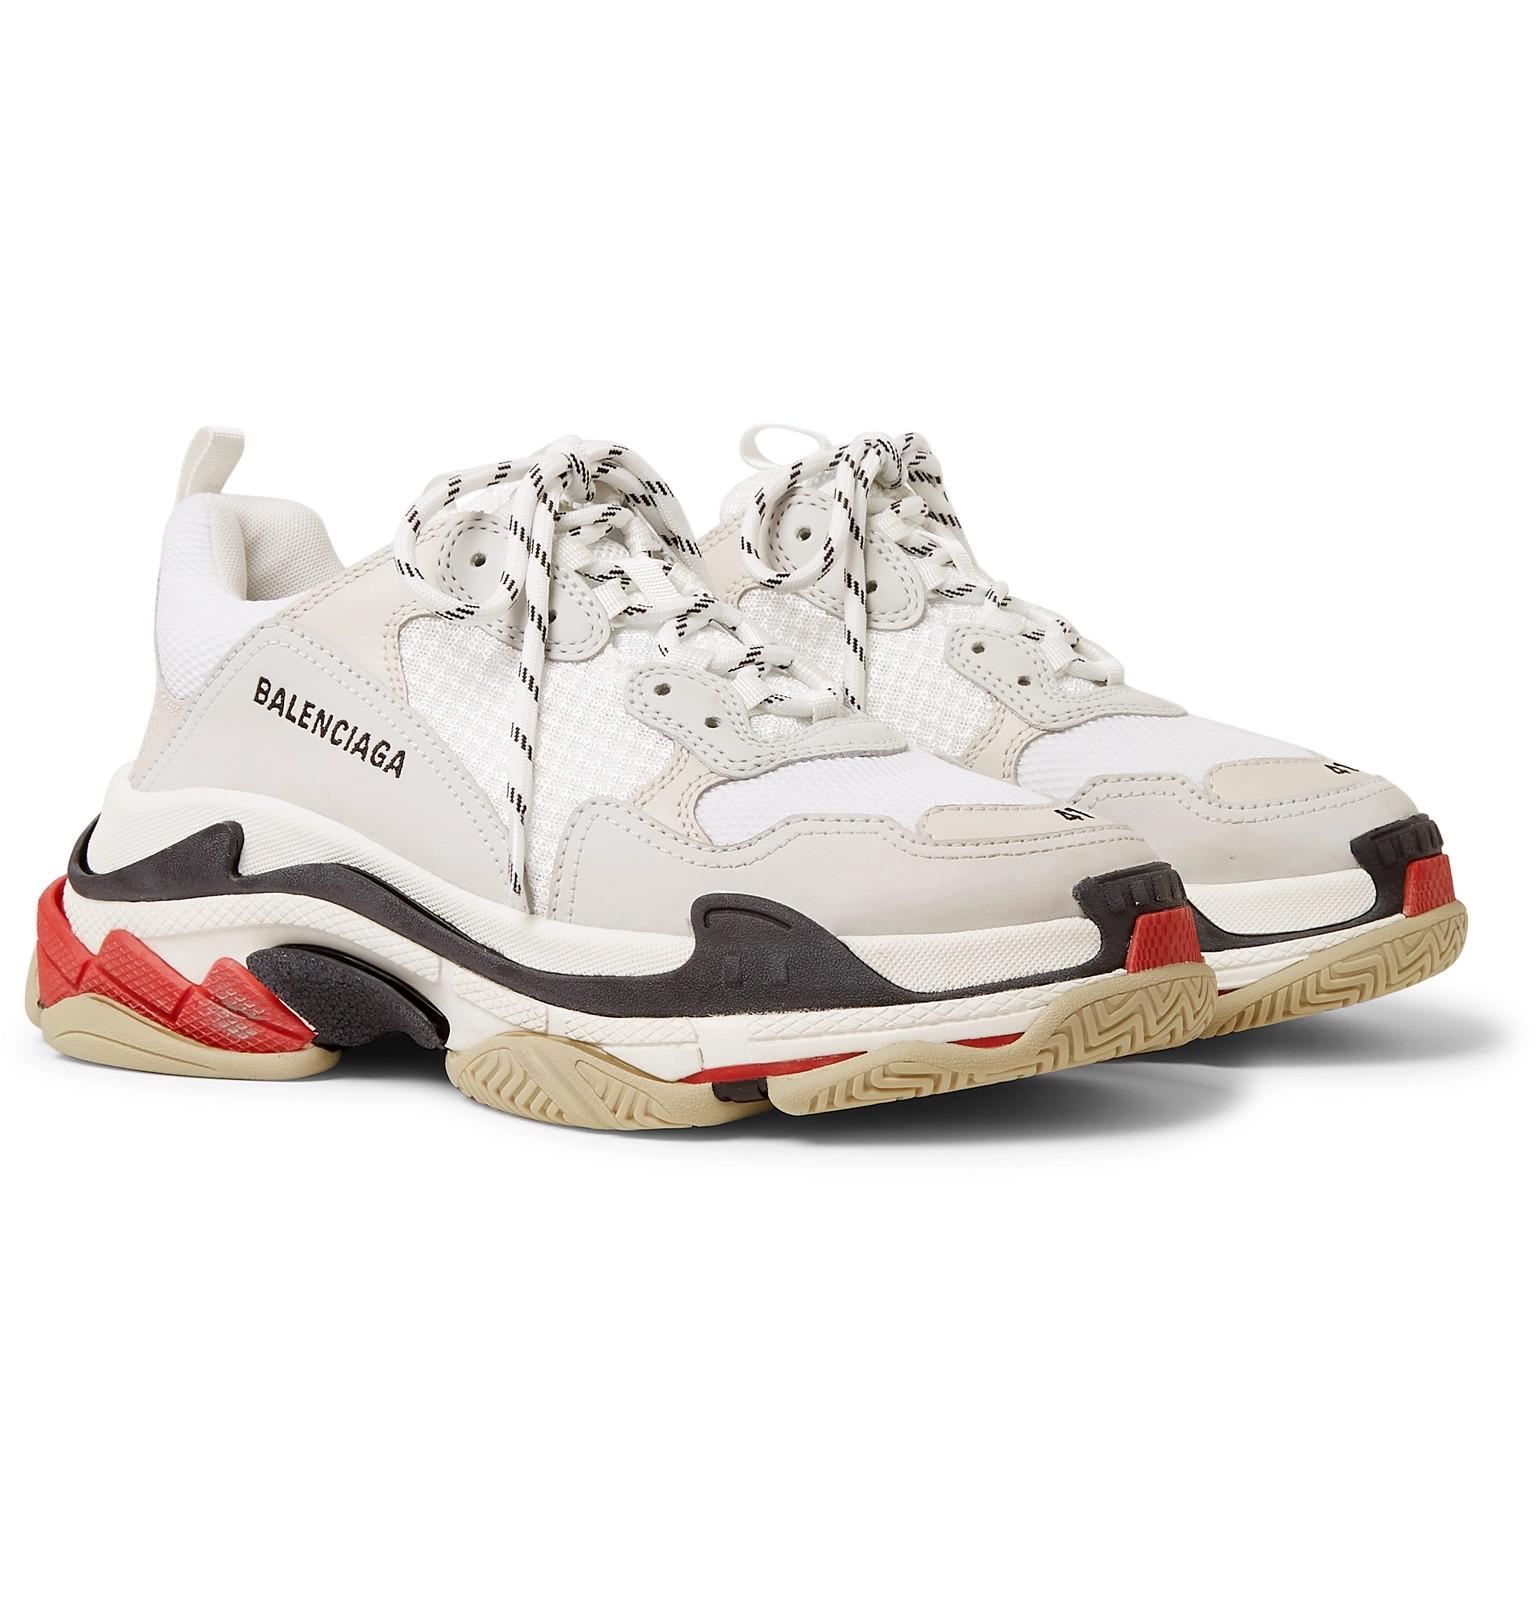 349ec964b Balenciaga - Triple S Leather and Mesh Sneakers